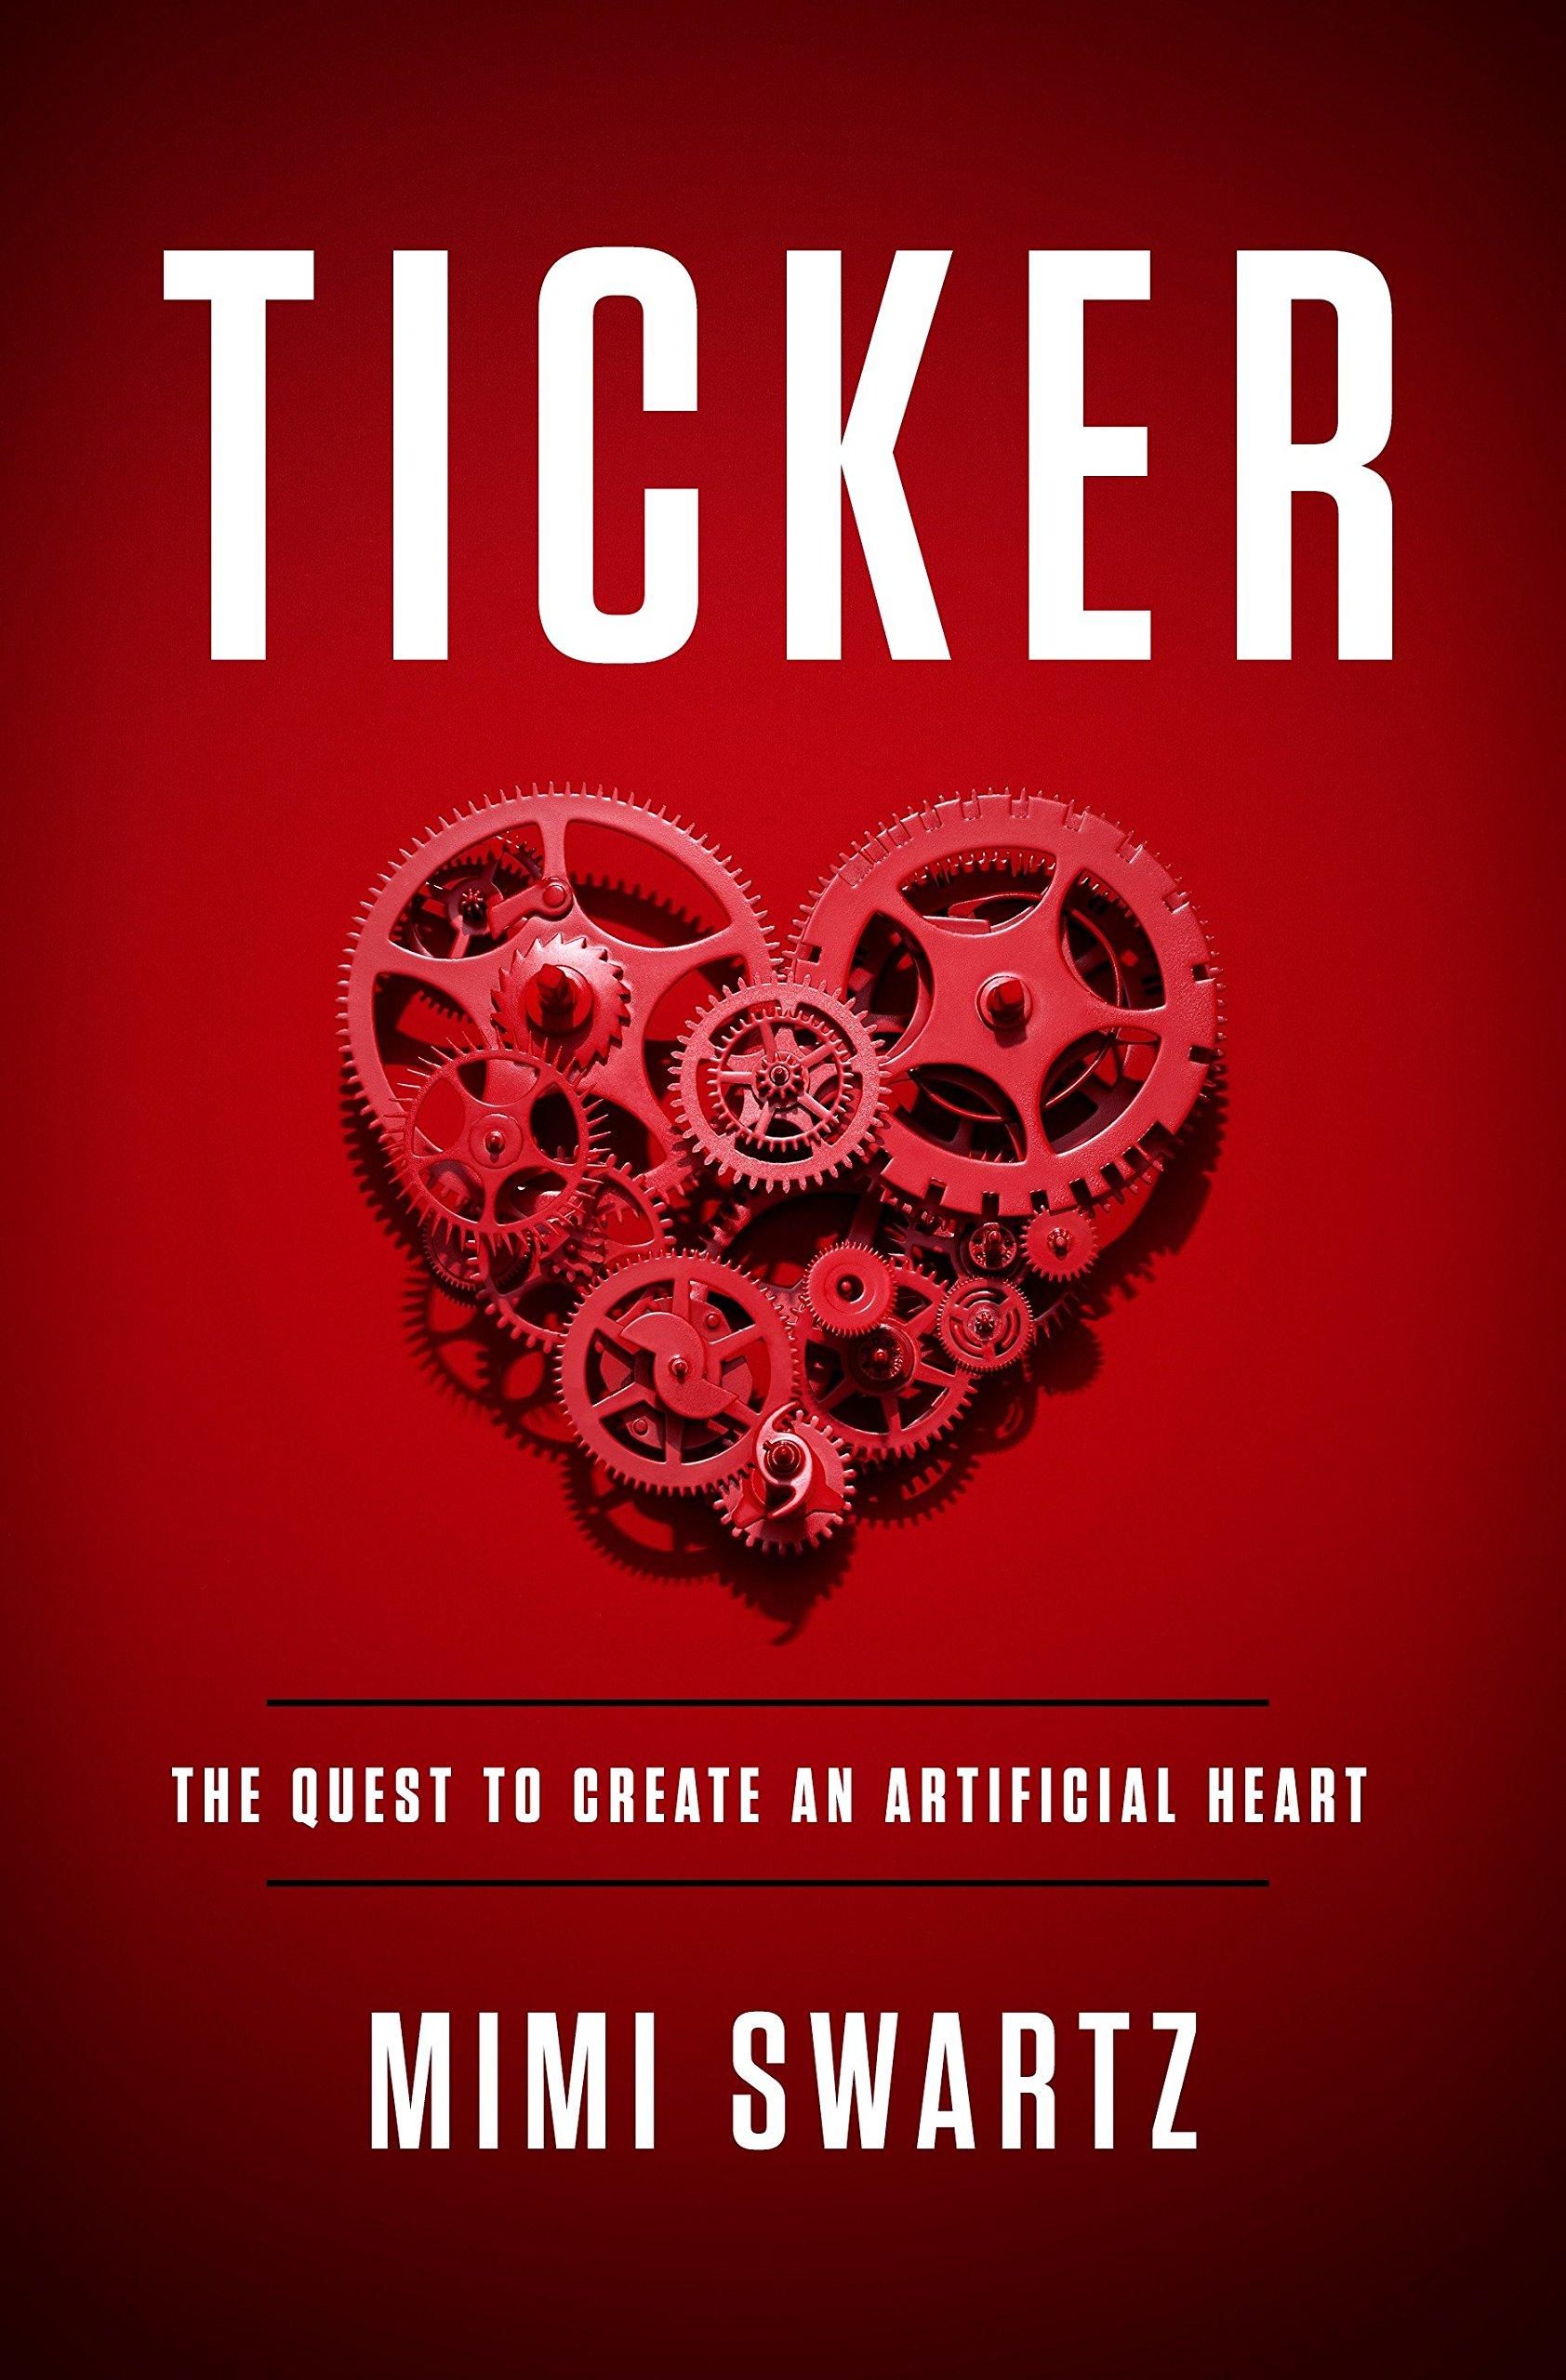 Ticker The Quest To Create An Artificial Heart Mimi Swartz